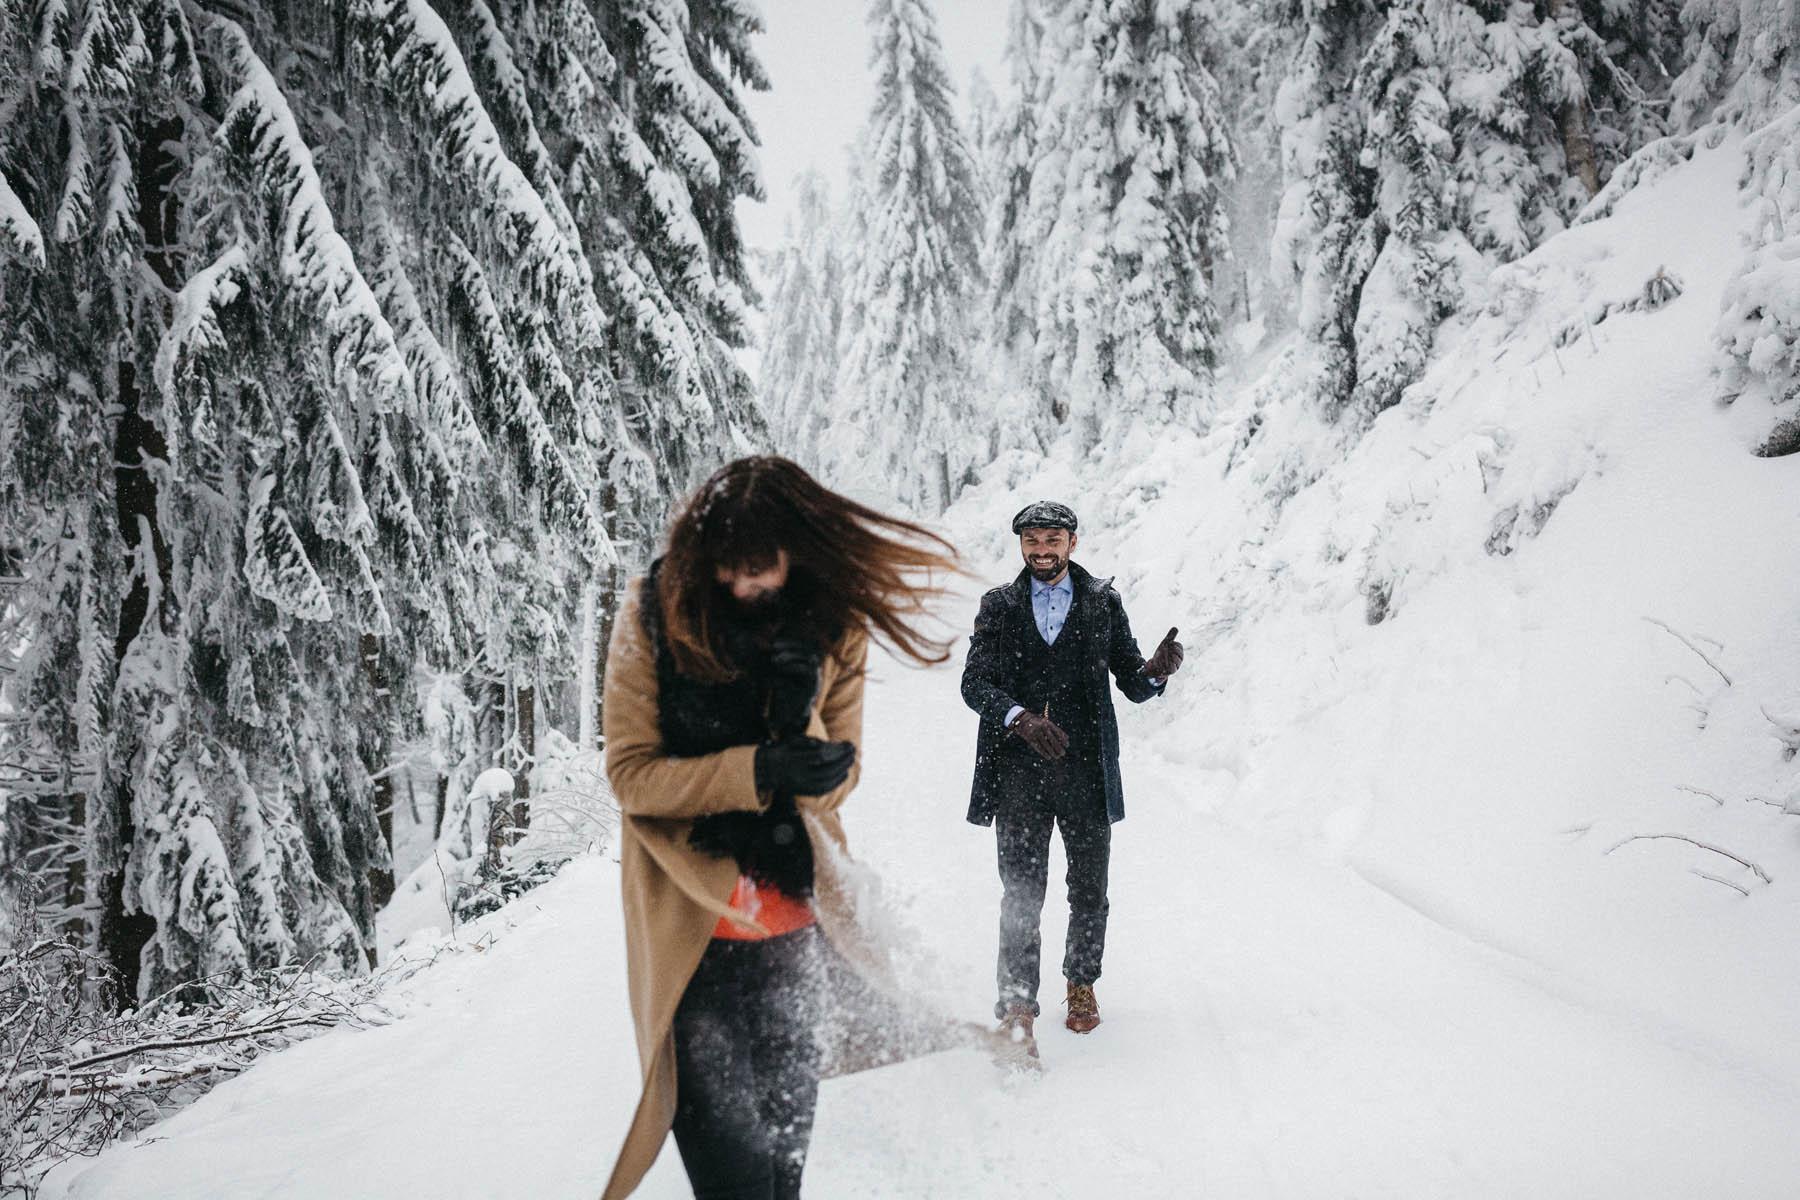 Raissa Simon Fotografie Paarshooting Nais Andre Winter Schwarzwaldhochstrasse 17